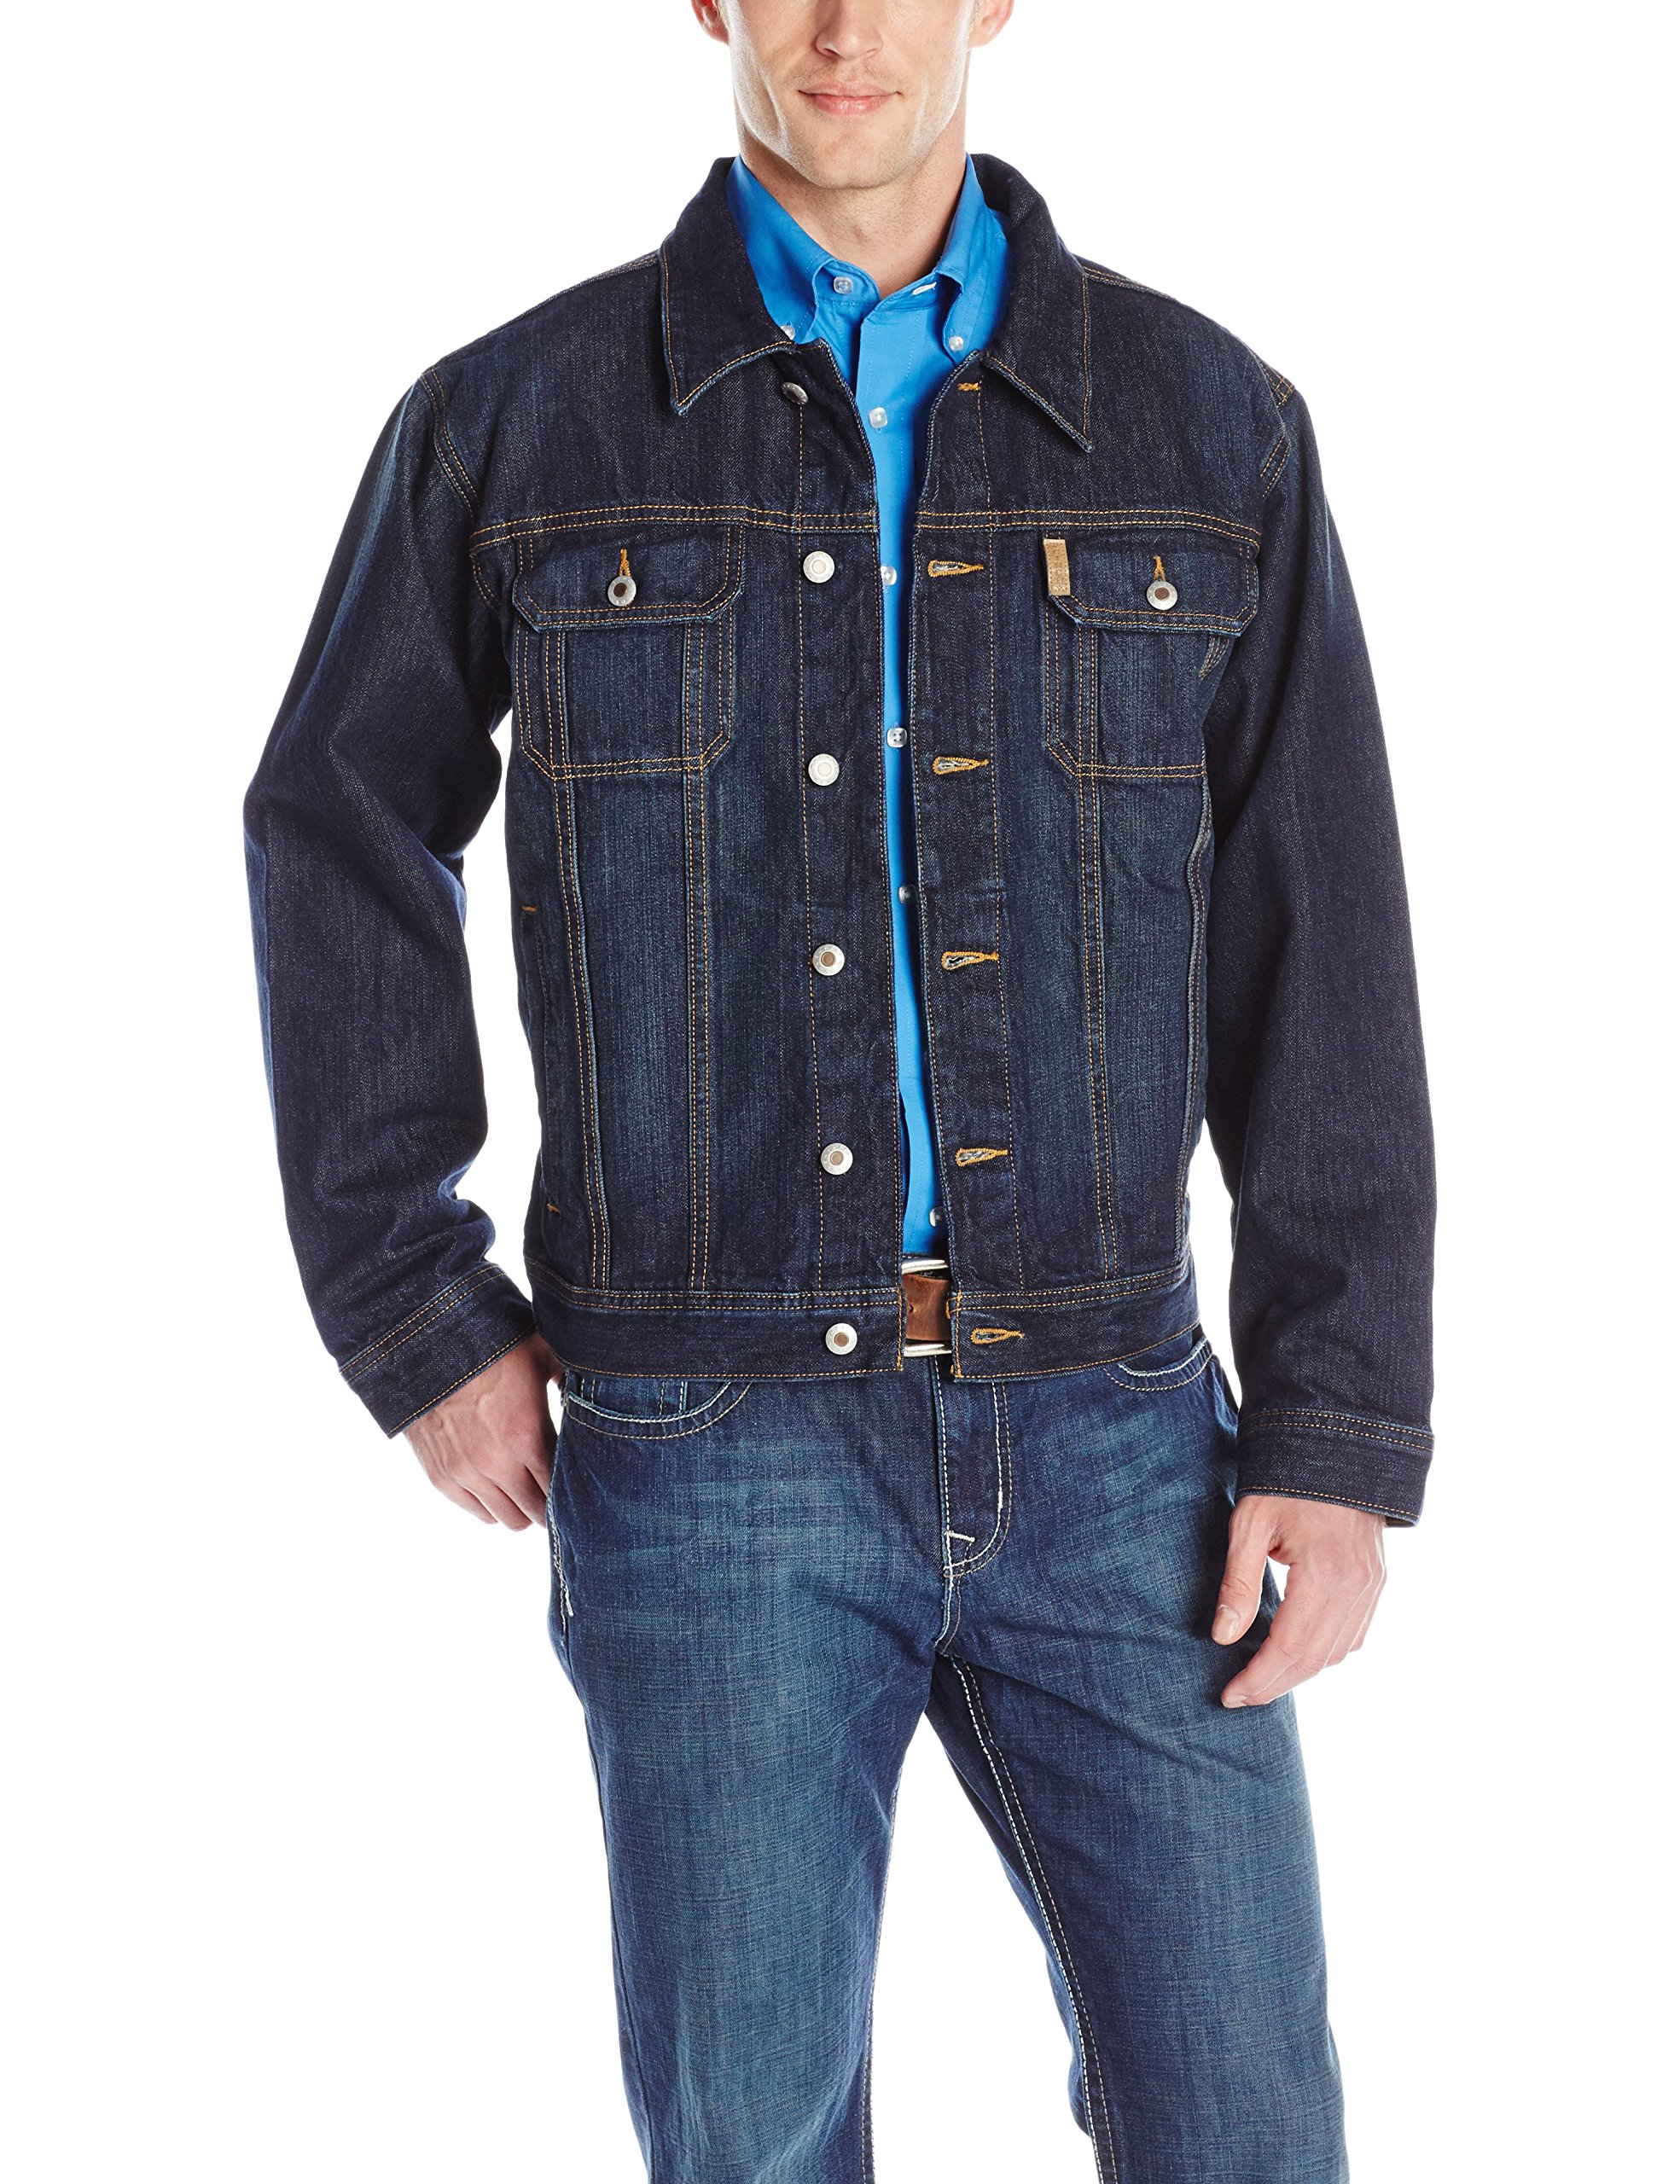 Cinch Men's Dark Stonewash Denim Jacket, Indigo, Medium